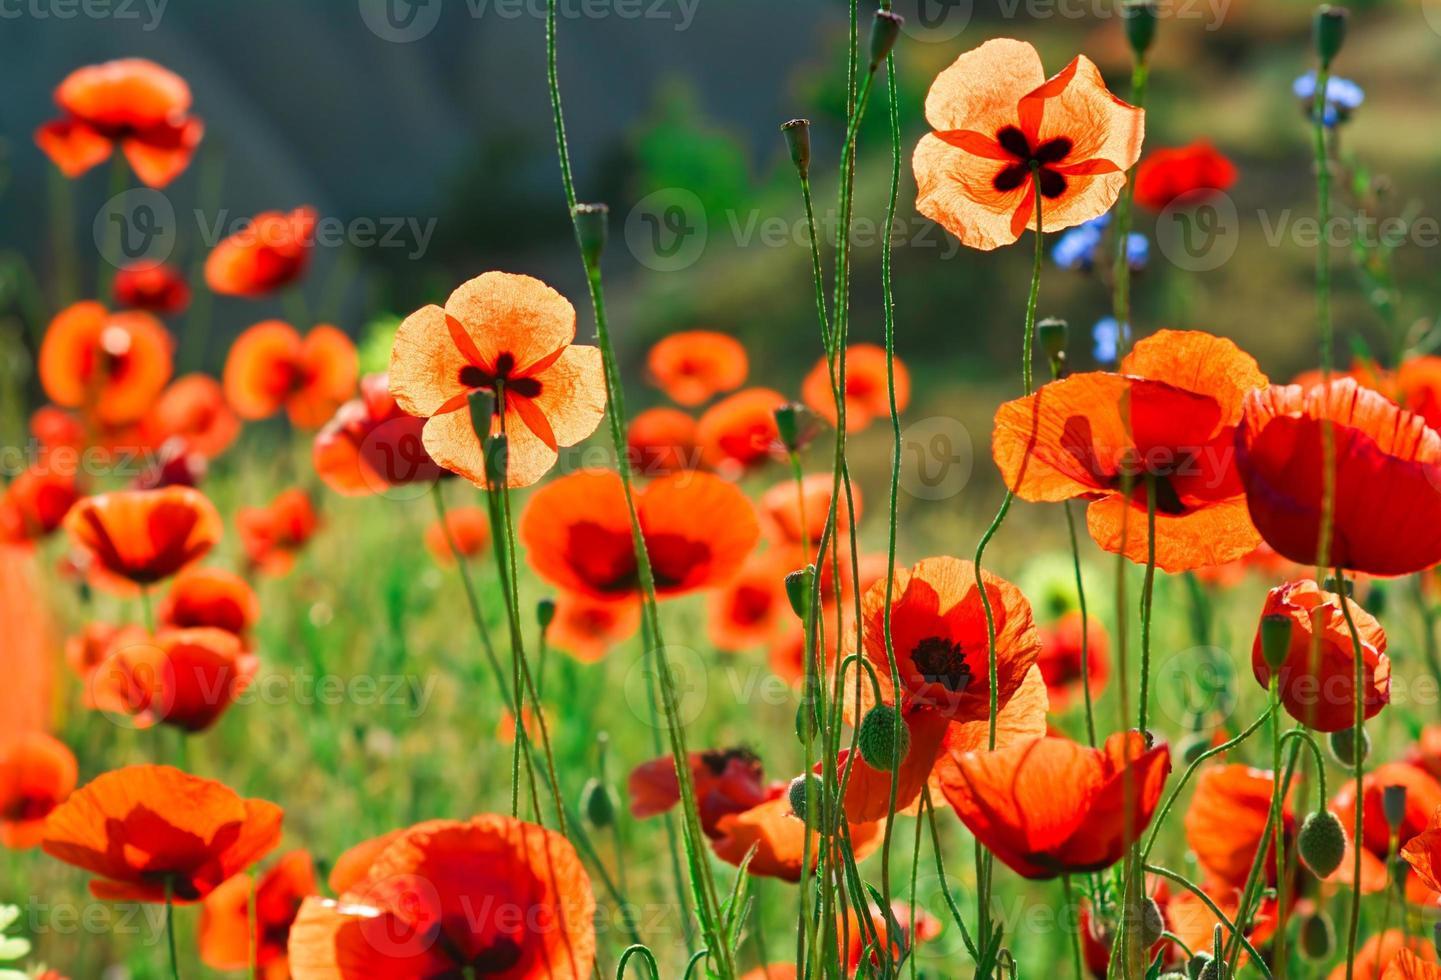 Poppy flowers. Shallow depth of field photo